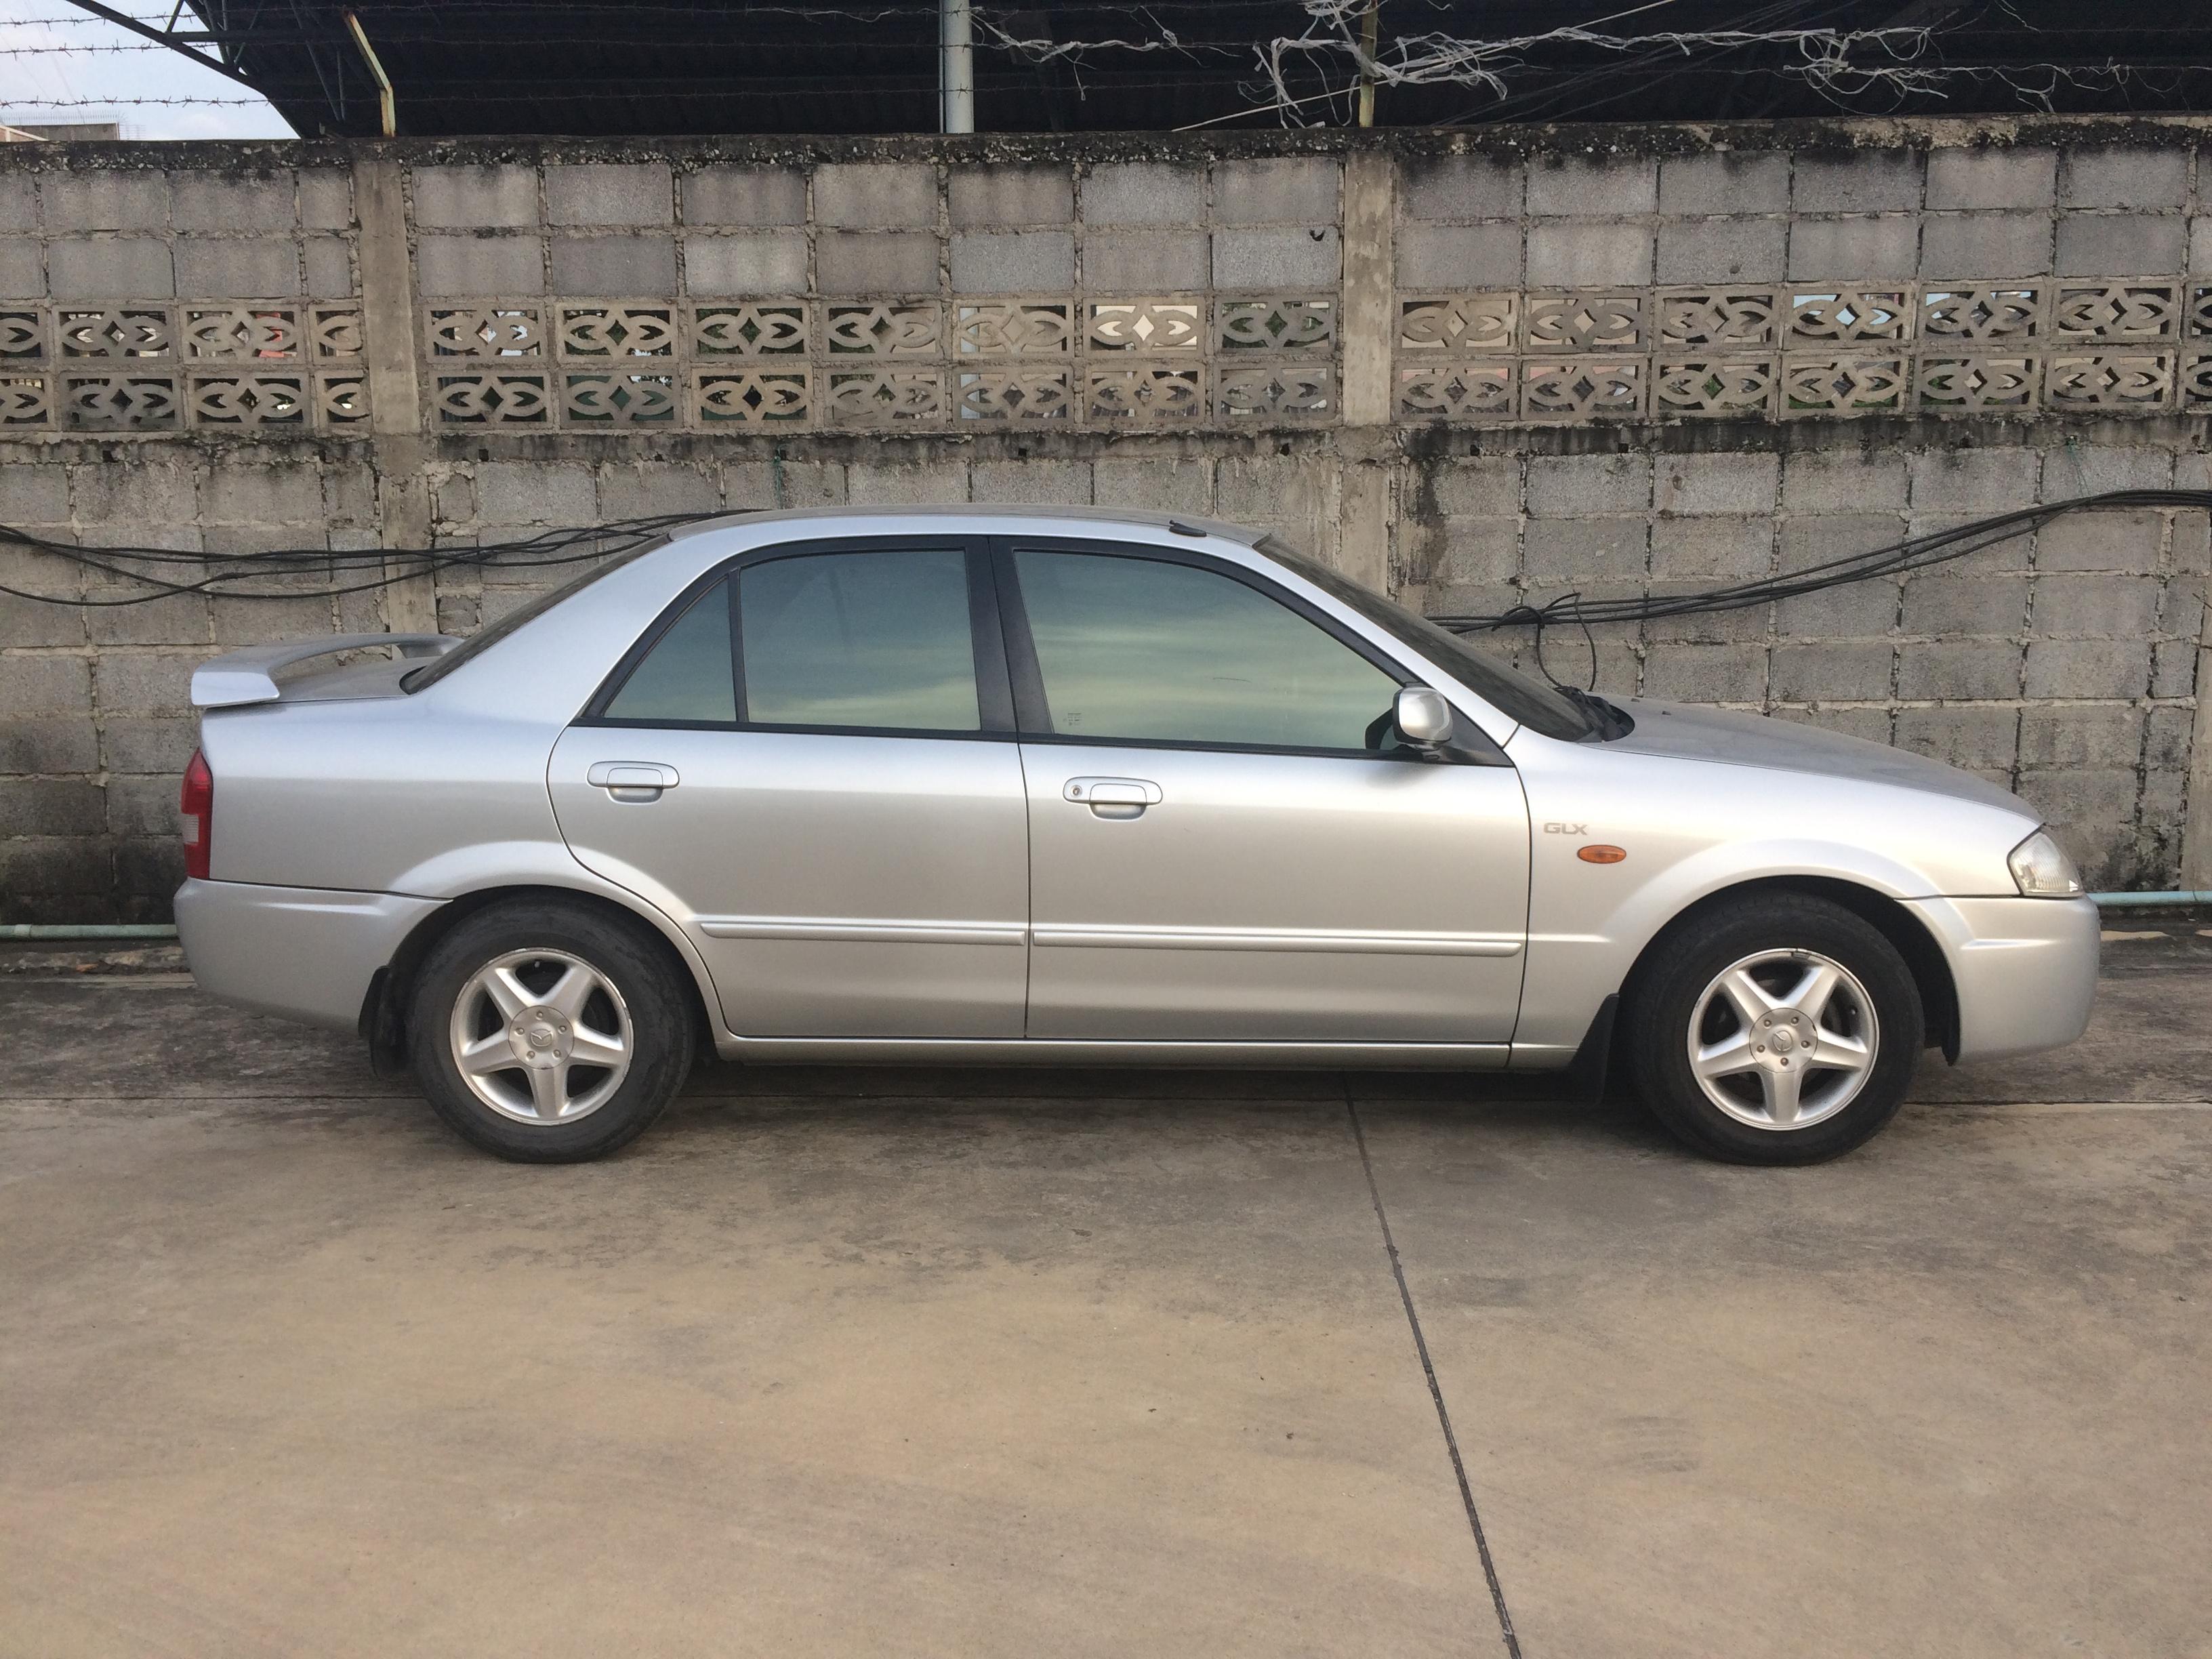 Kelebihan Kekurangan Mazda 323 2000 Review